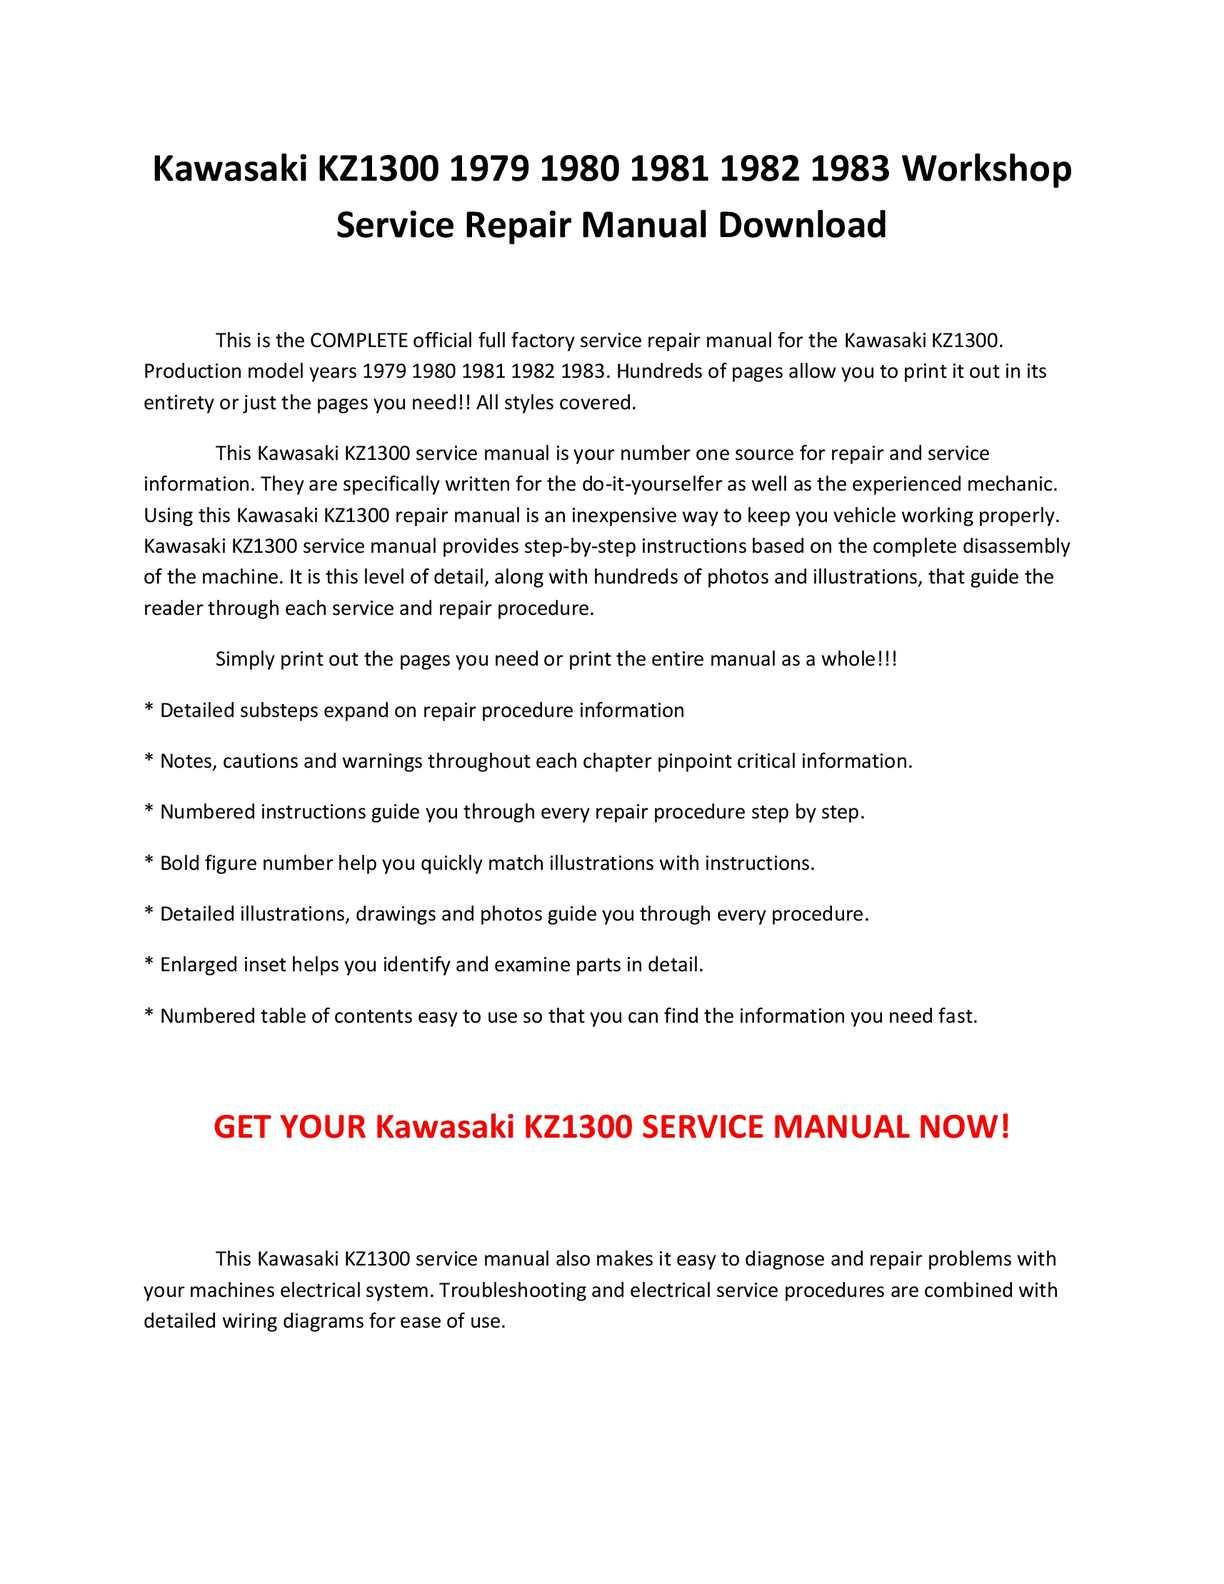 calam atilde copy o kawasaki kz service repair calamatildecopyo kawasaki kz1300 1979 1980 1981 1982 1983 service repair manual pdf